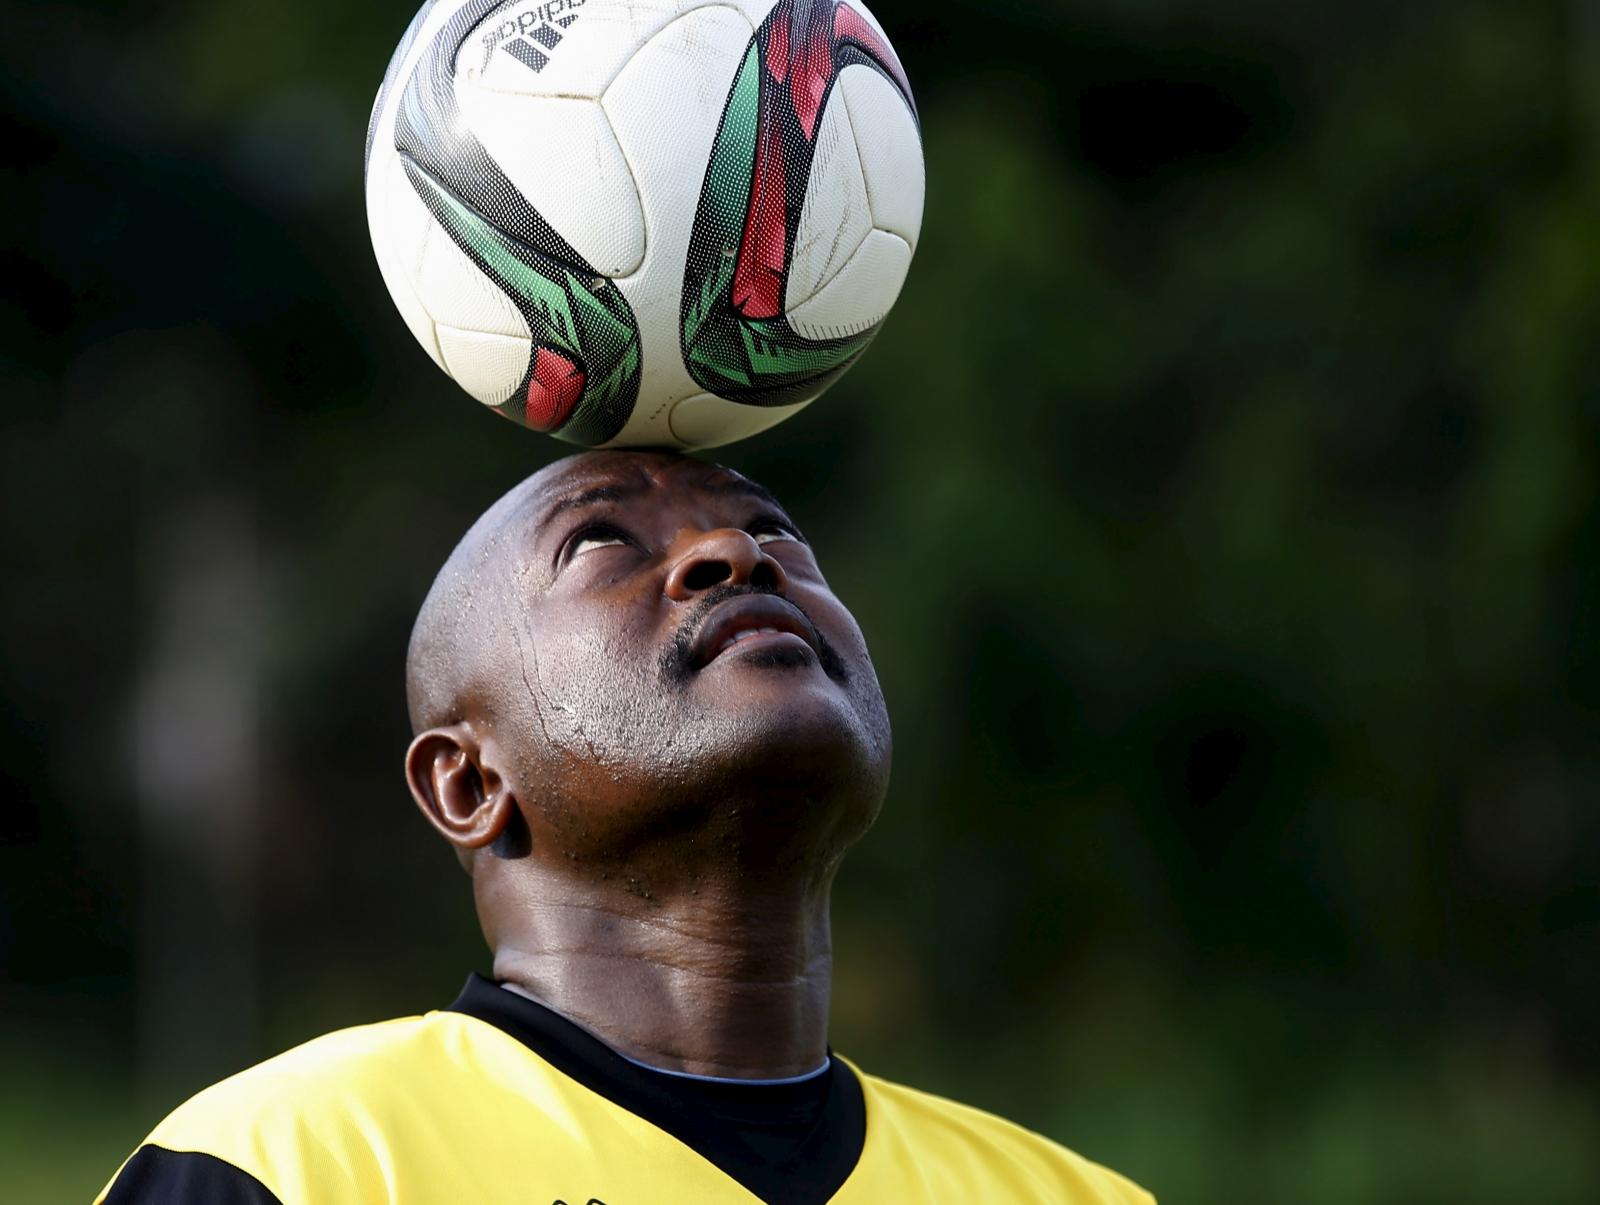 Nkurunziza Burundi football